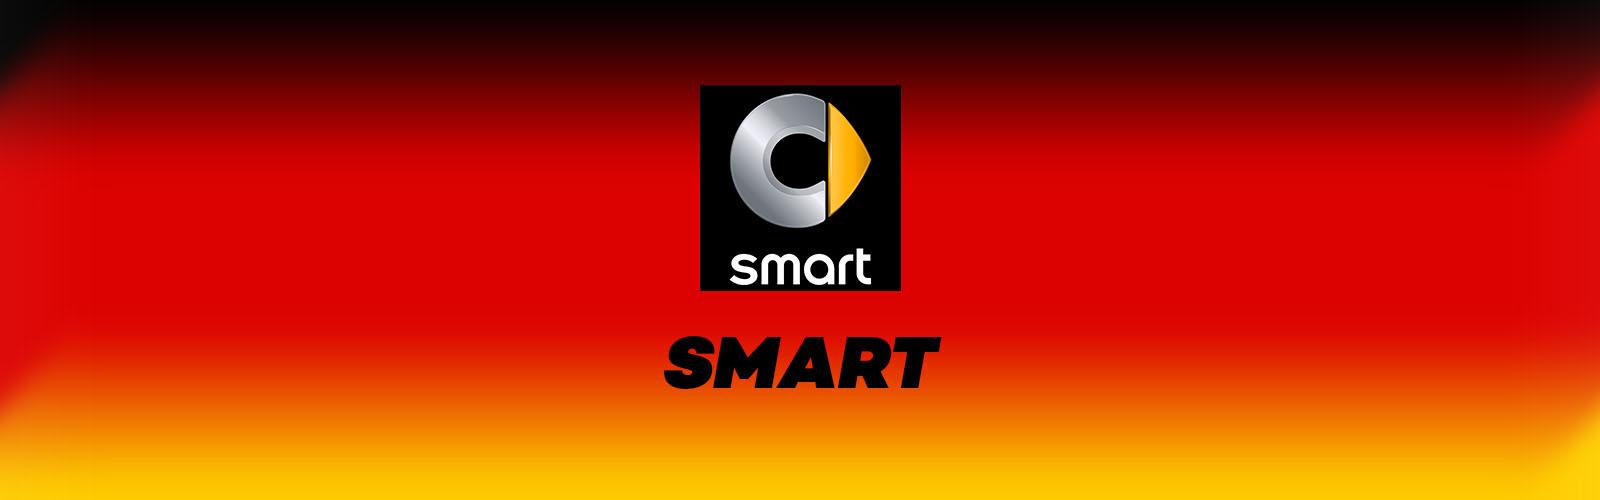 smart logo marque